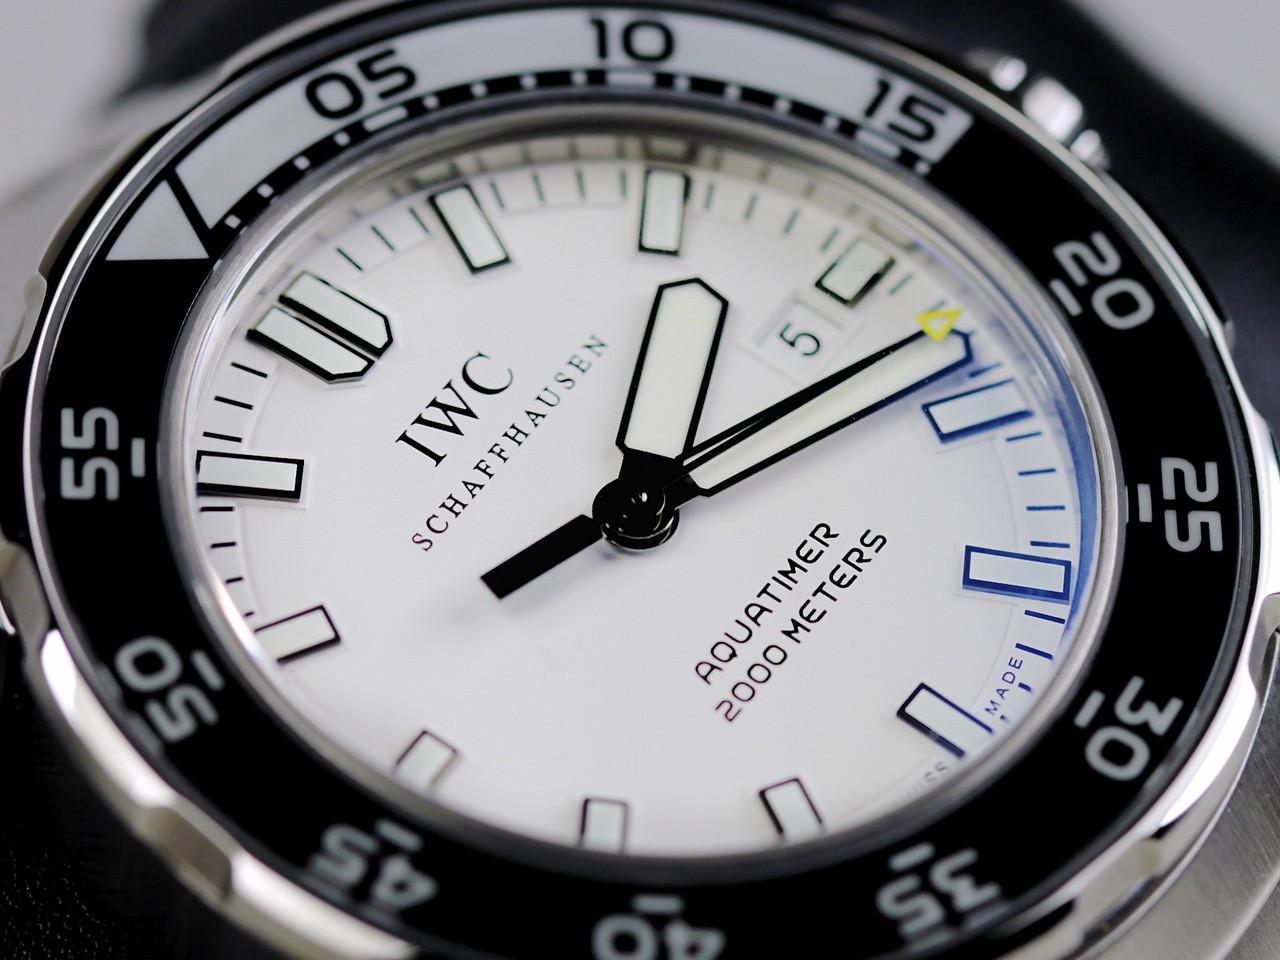 Dial & Bezel Detail - IWC Watch - Aquatimer 2000 Automatic IW356809 - www.Legendoftime.com - Chicago Watch Center